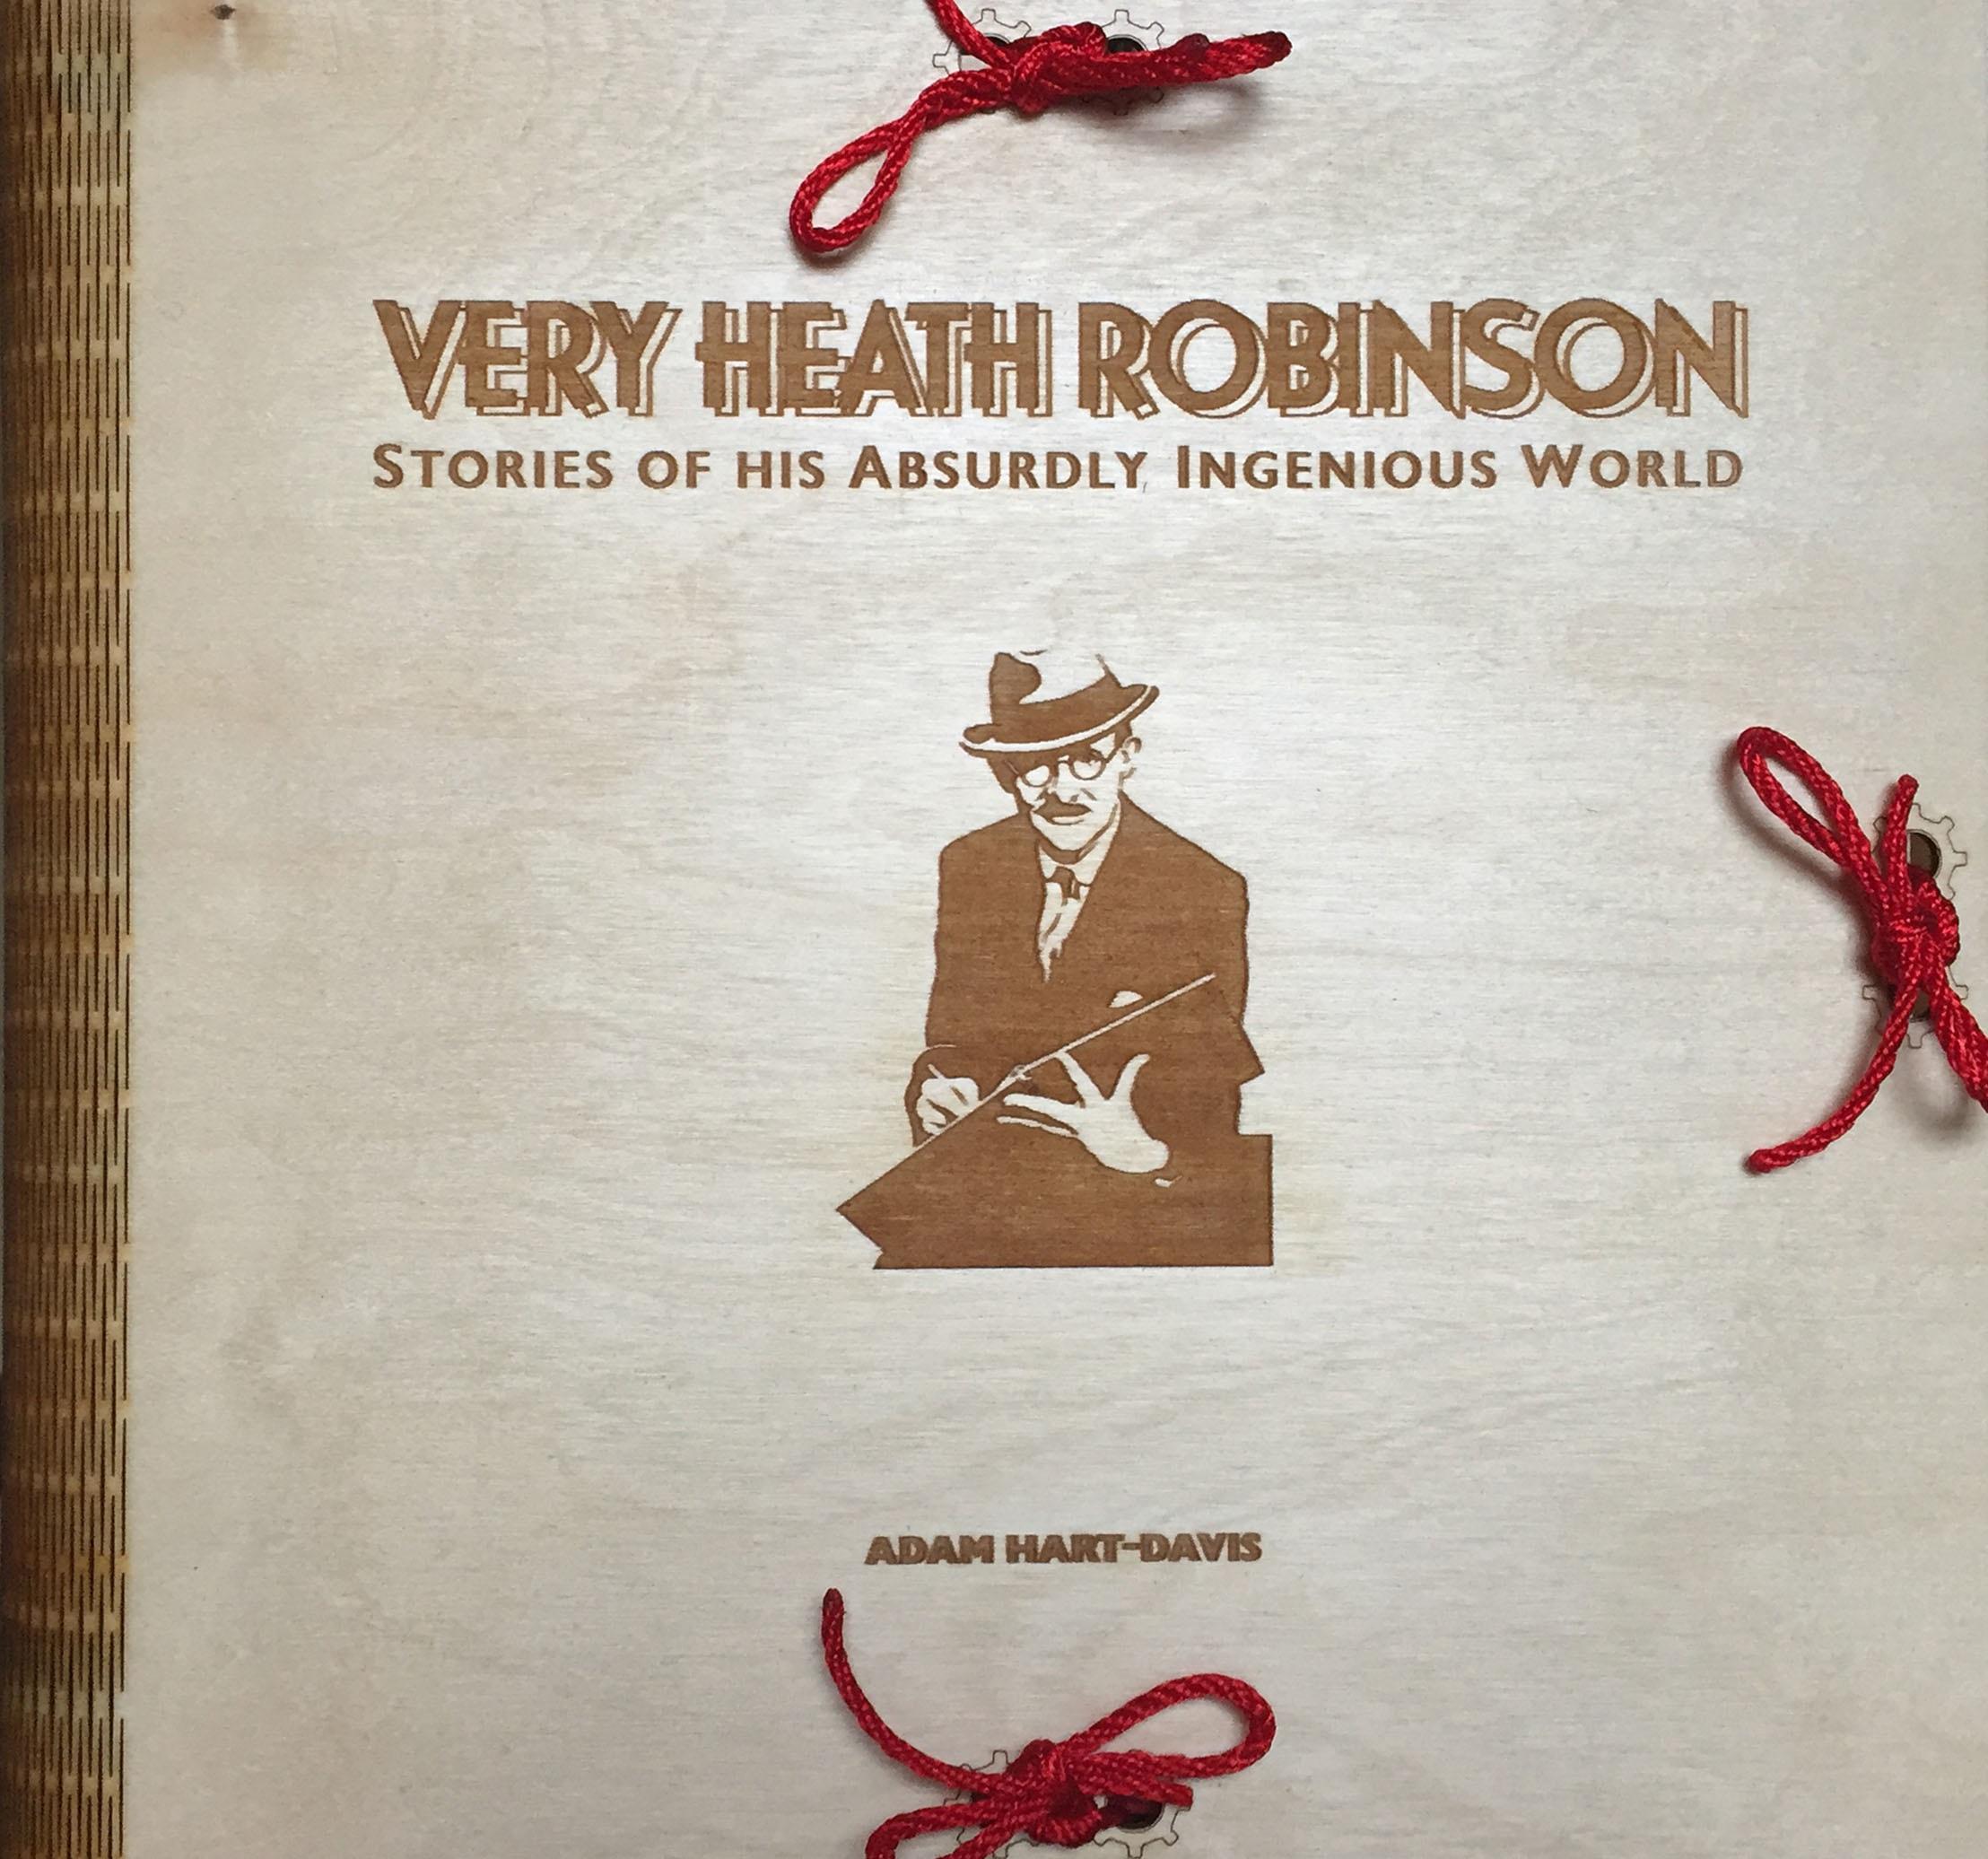 Photo of Heath Robinson wood case.